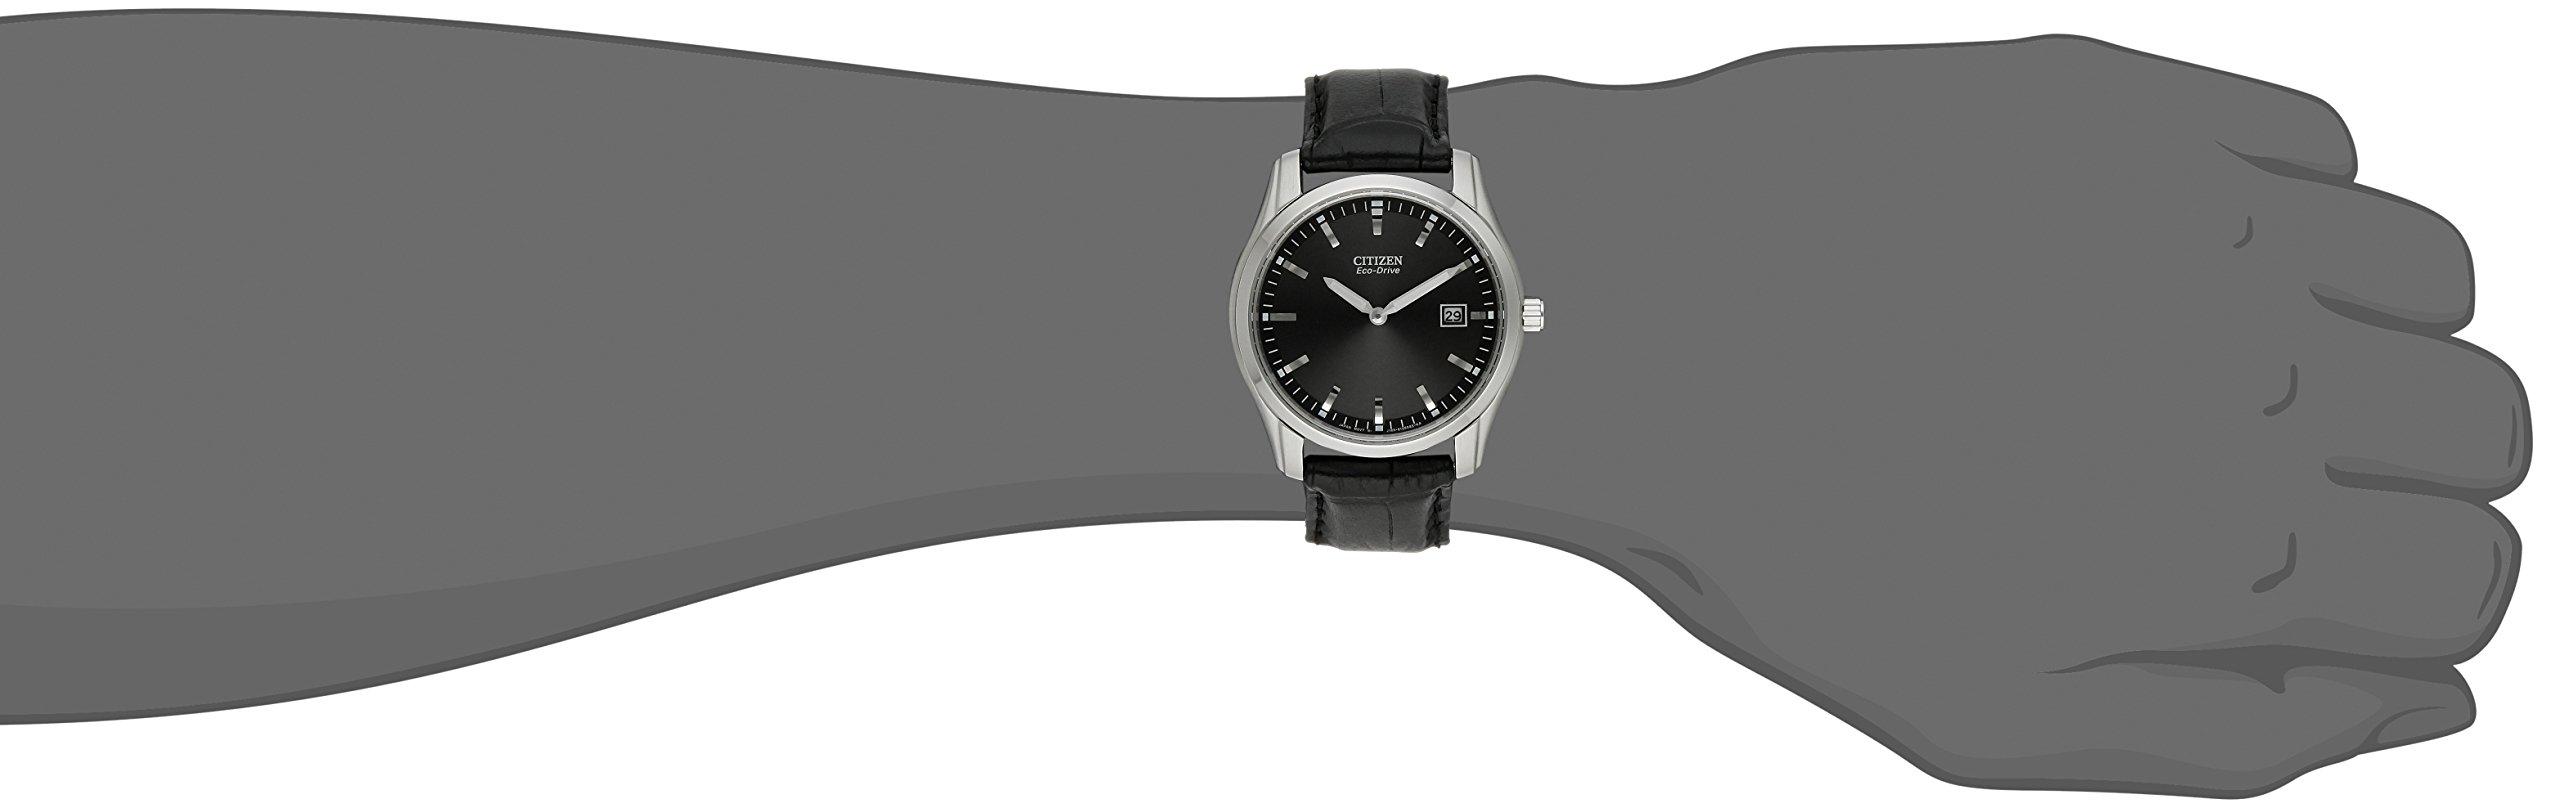 Citizen Men's Eco-Drive Stainless Steel Watch, AU1040-08E by Citizen (Image #3)